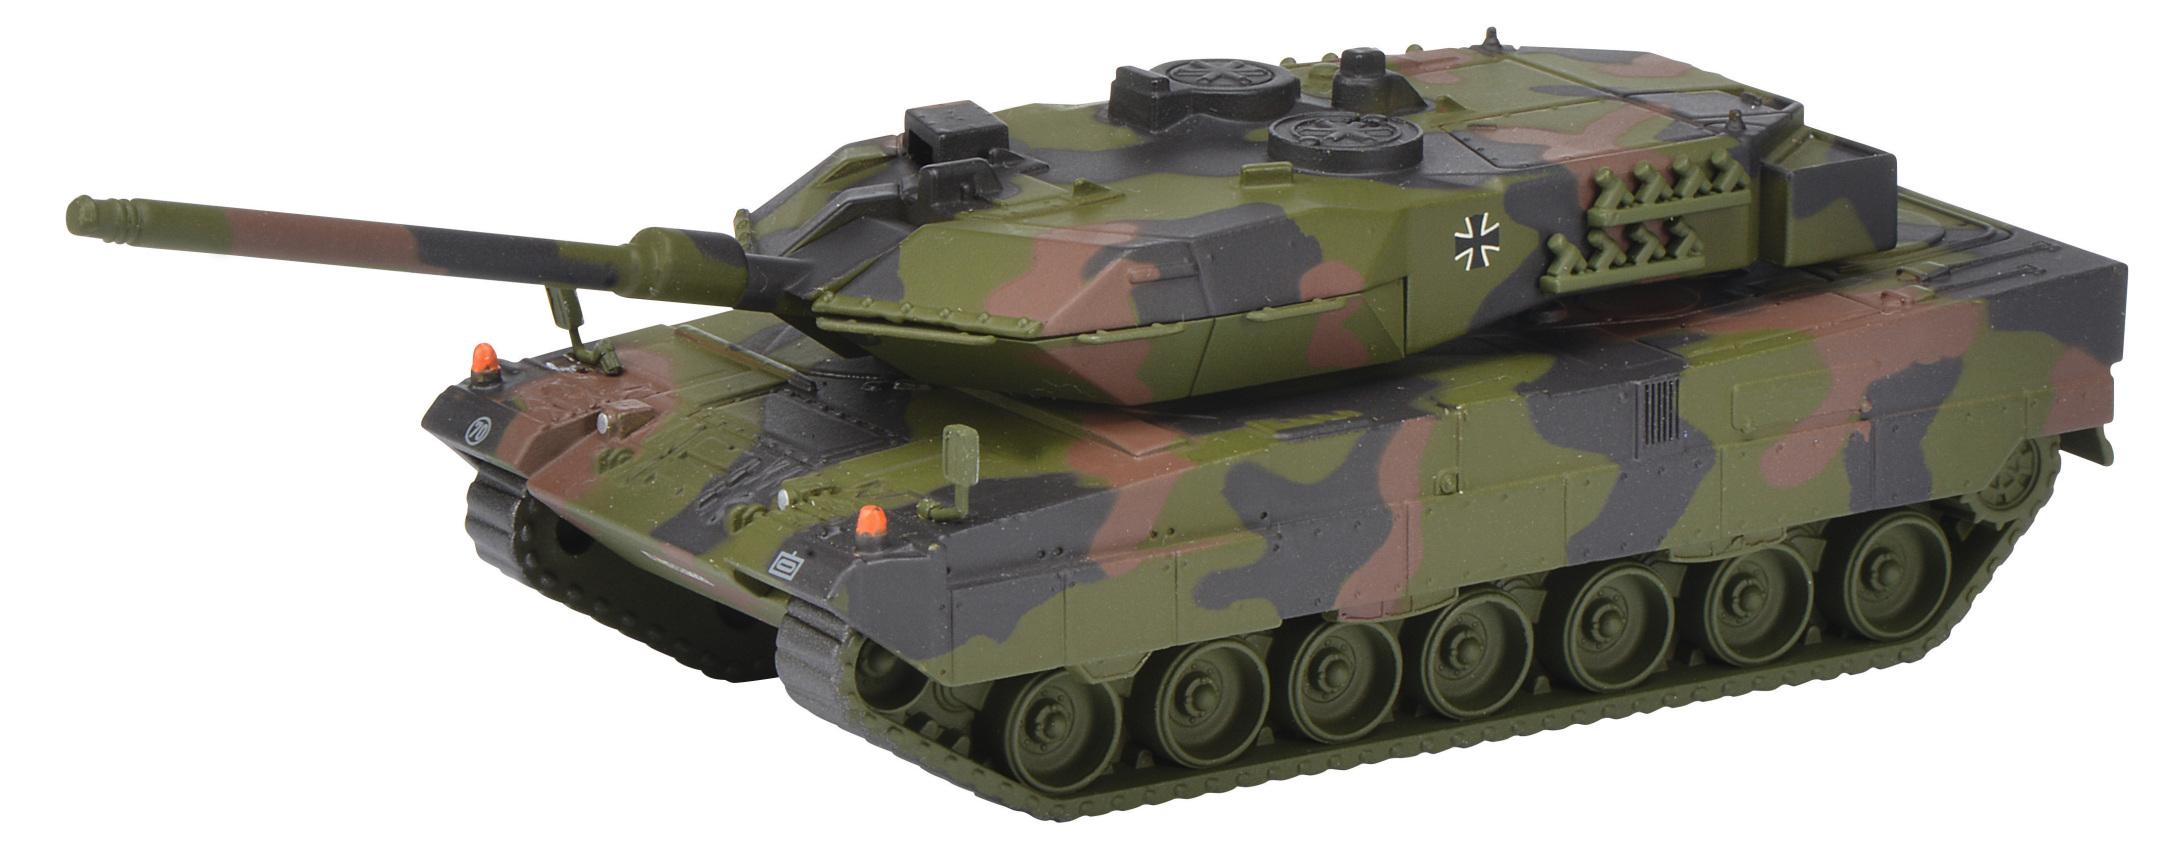 Leopard 2A6 Kampfpanzer - Bundeswehr